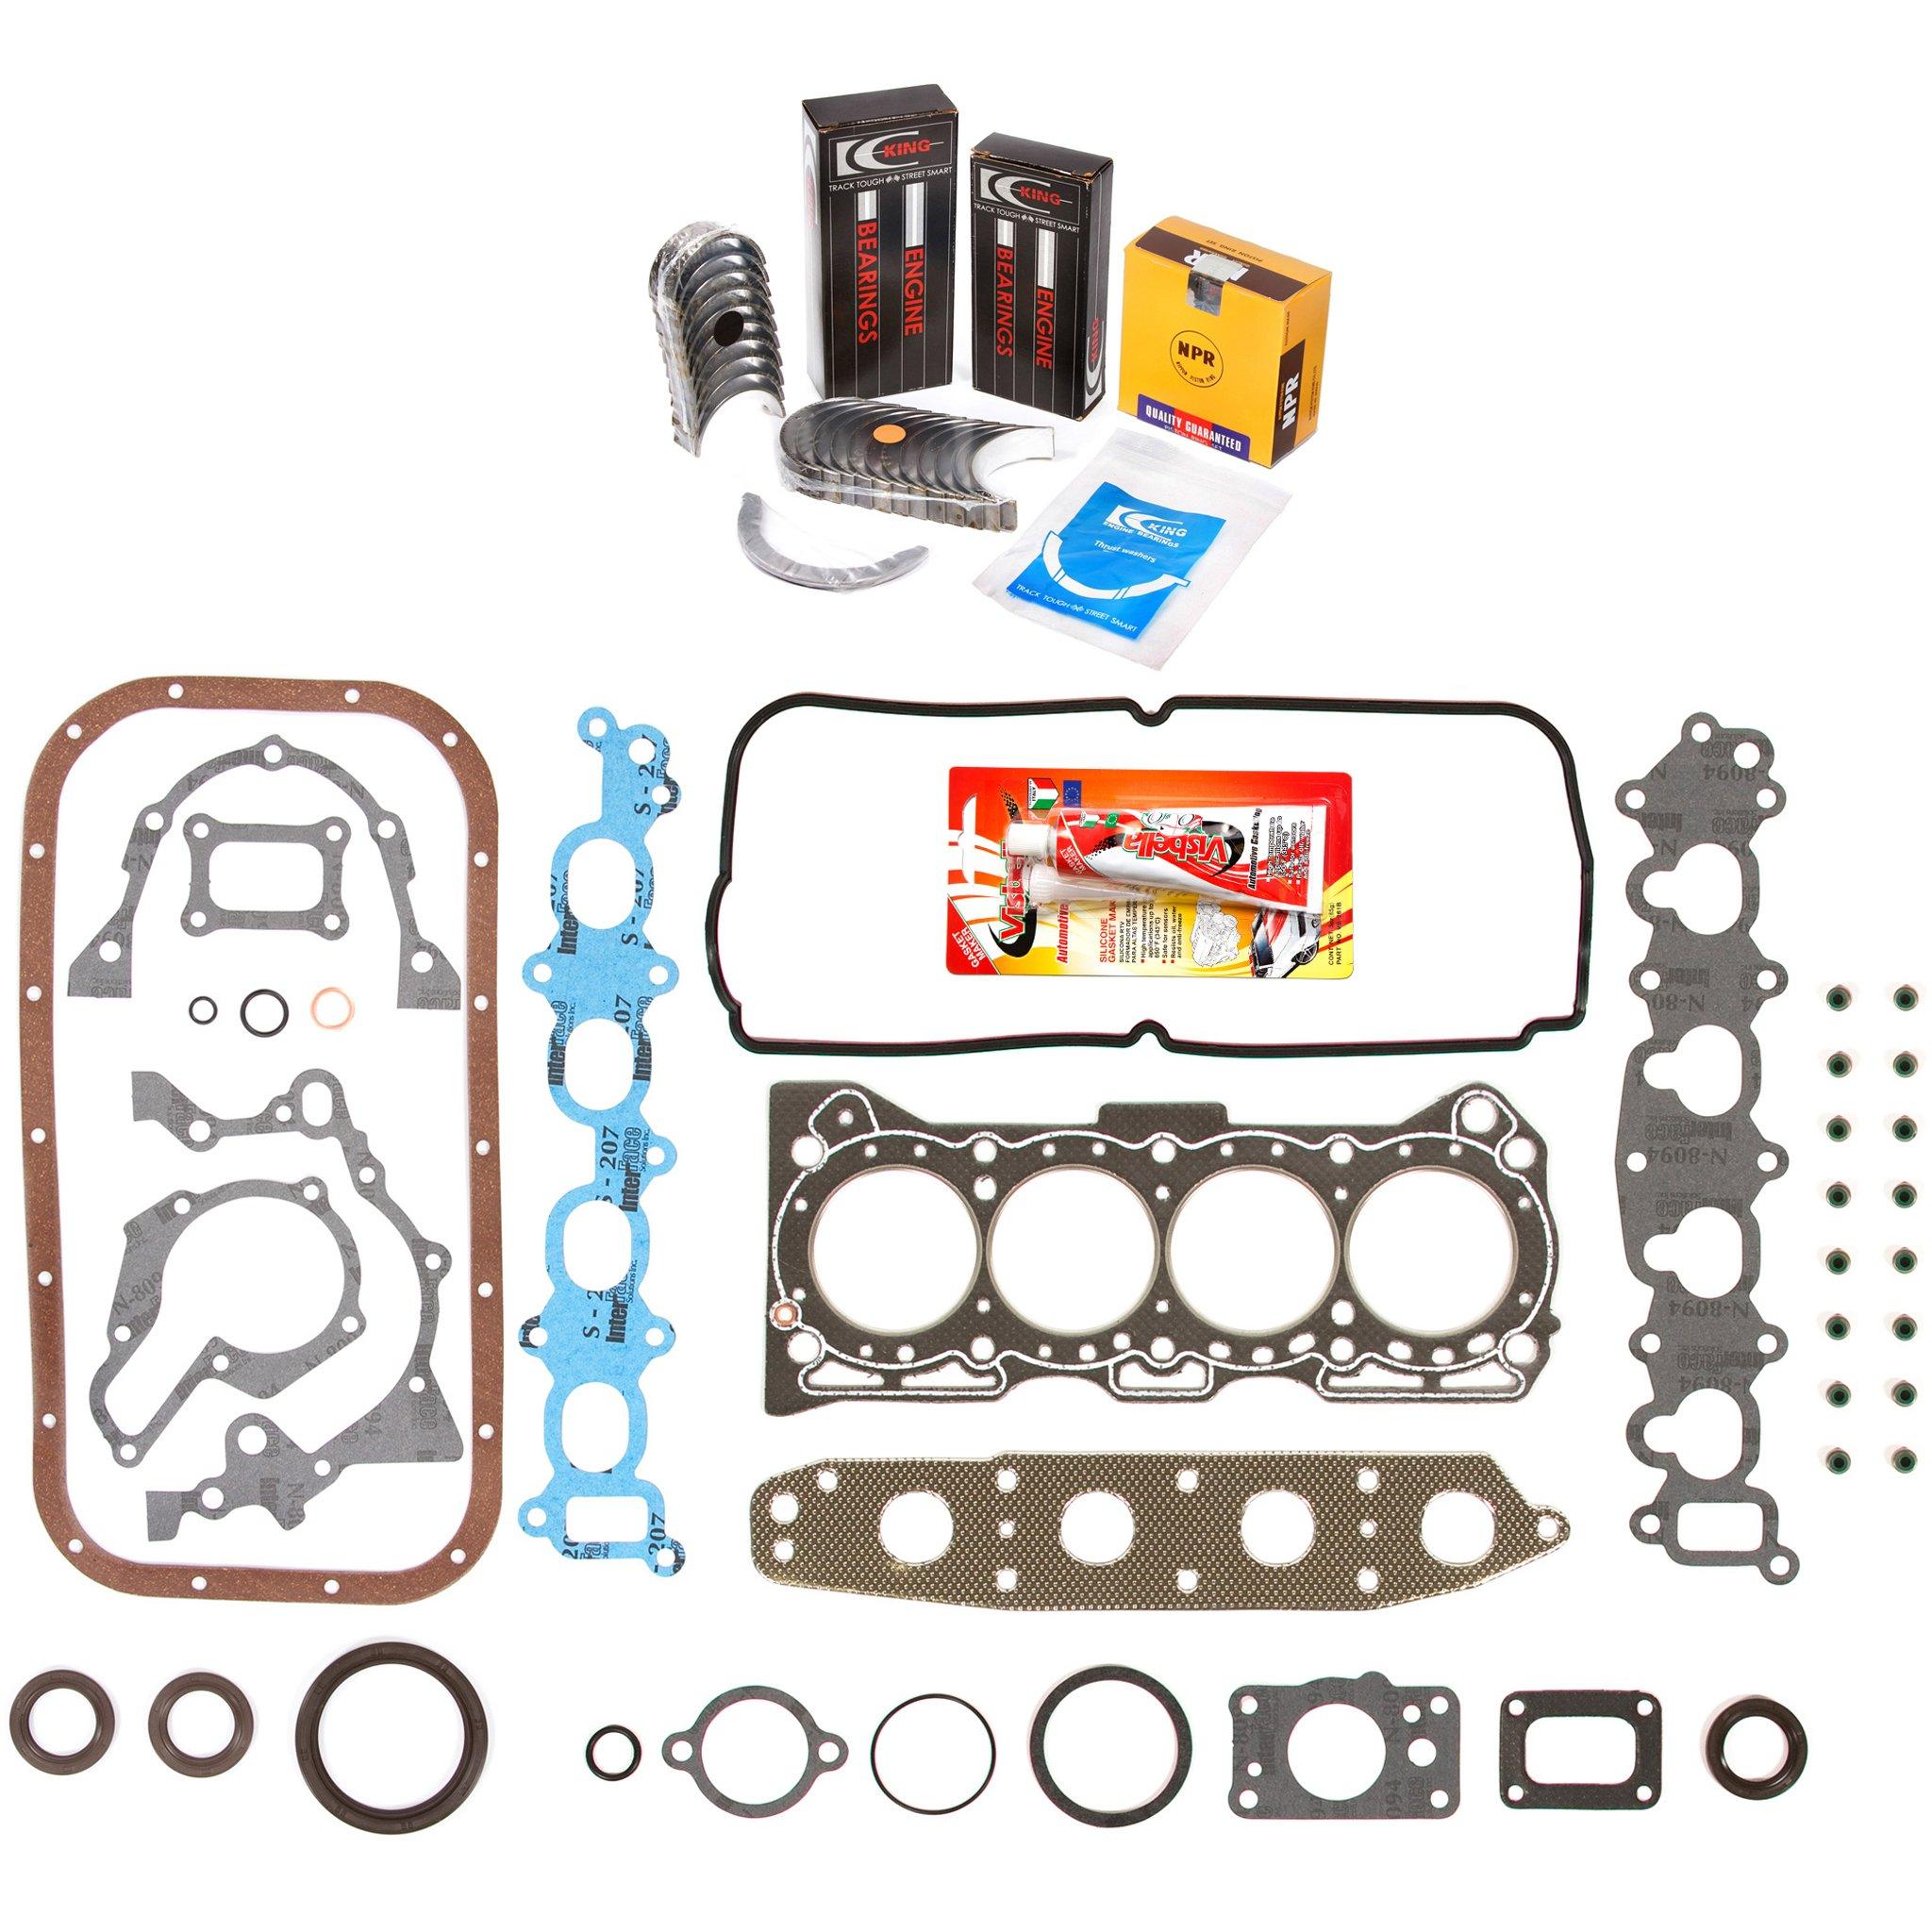 Domestic Gaskets Engine Rering Kit FSBRR8008 92-01 Suzuki GEO Chevrolet 1.6 G16KV Full Gasket Set, Standard Size Main Rod Bearings, Standard Size Piston Rings by Domestic Gaskets